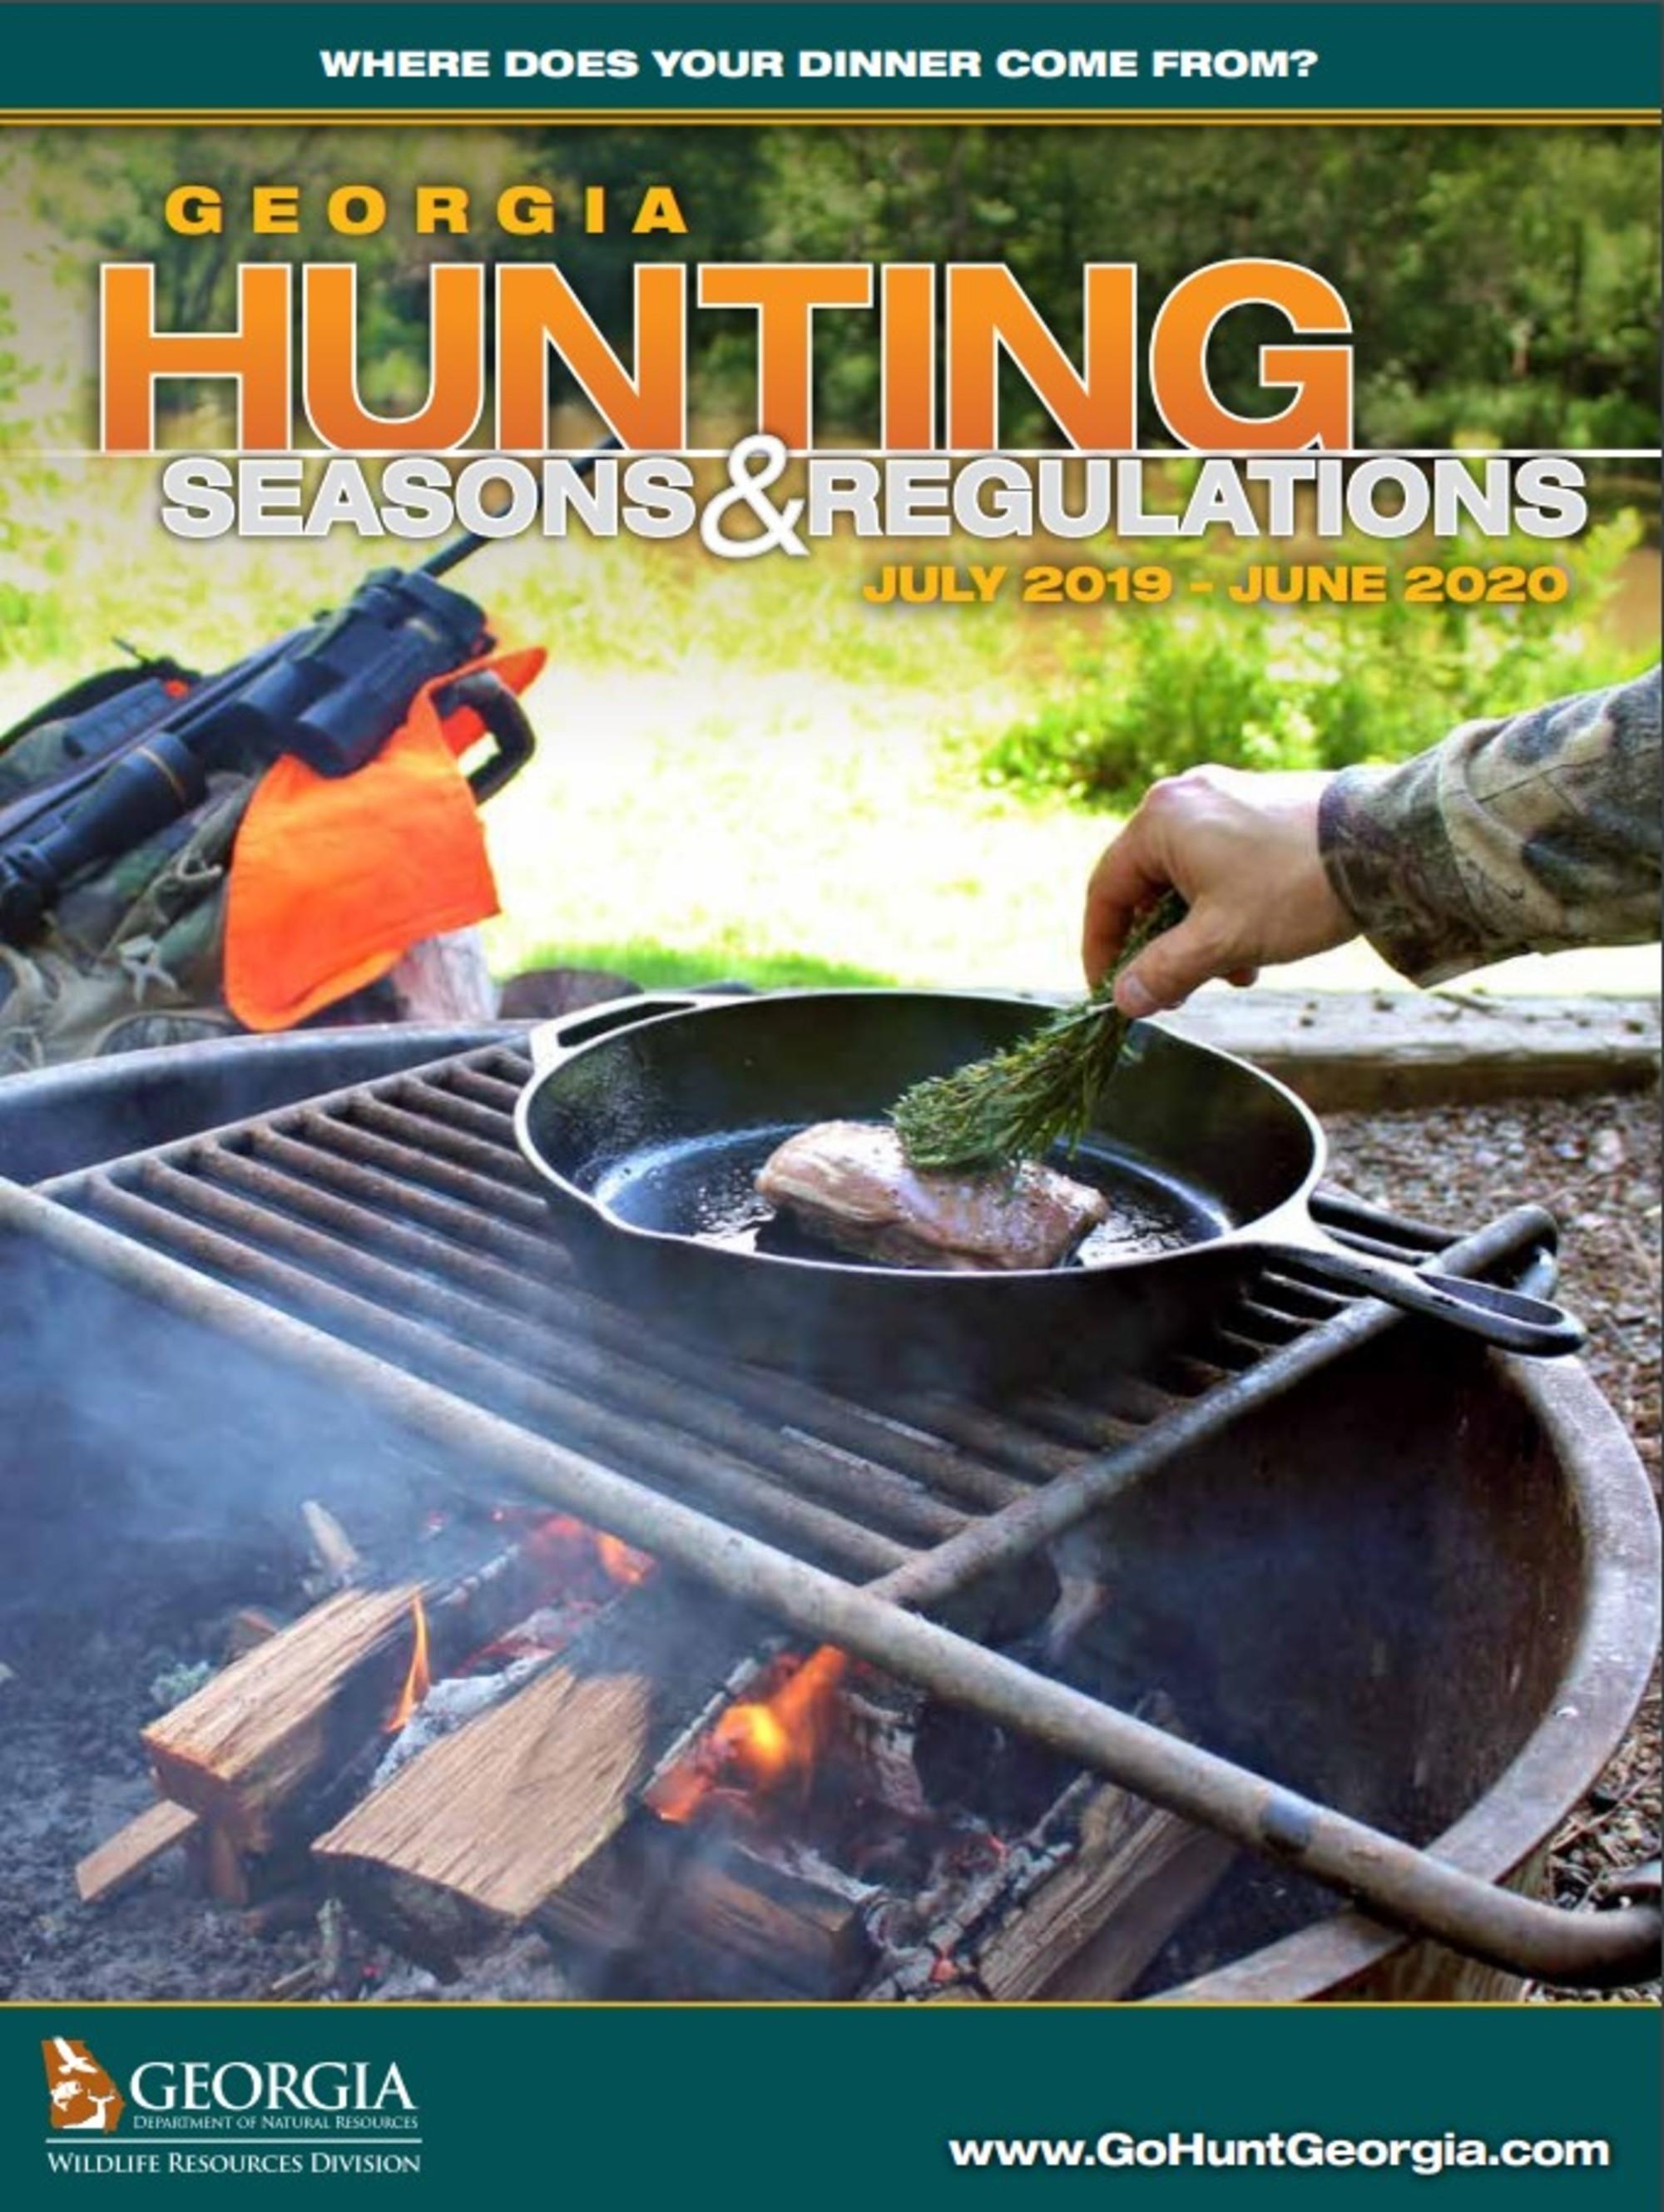 Georgia Hunting Seasons & Regulations July 2019 - June 2020  Georgia Deer Season 2020